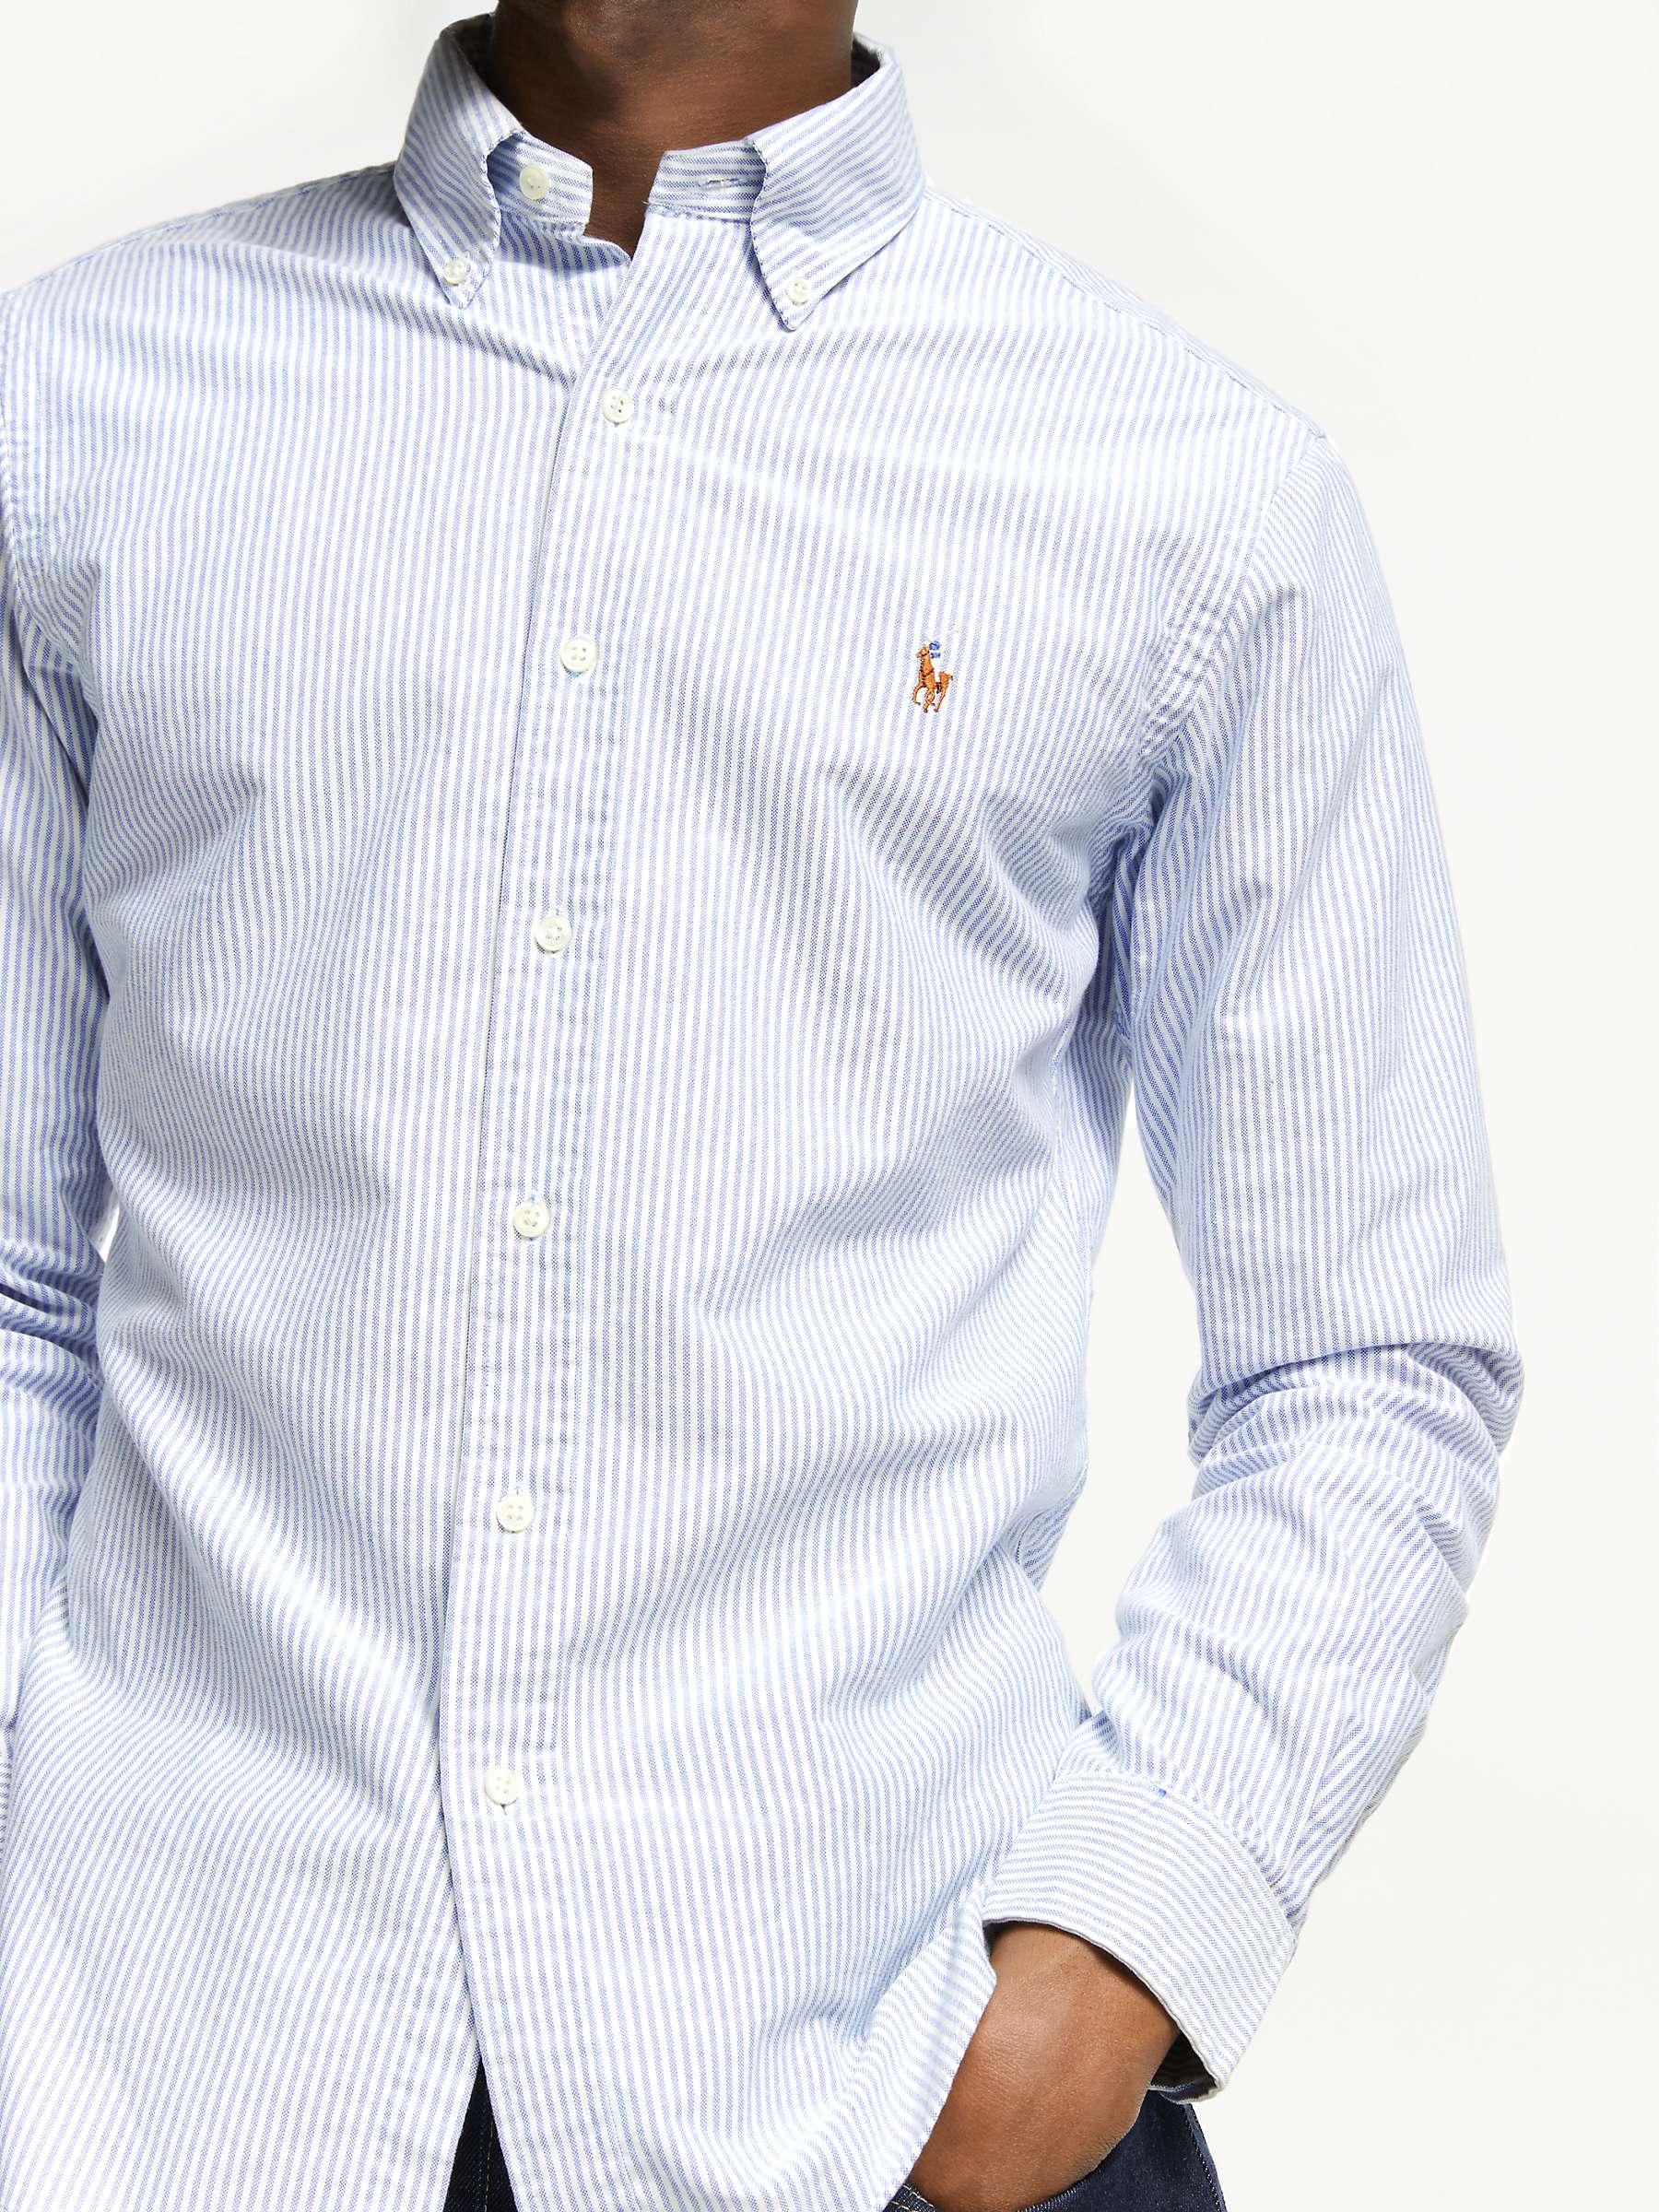 Ralph Lauren Oxford Shirt Slim Fit